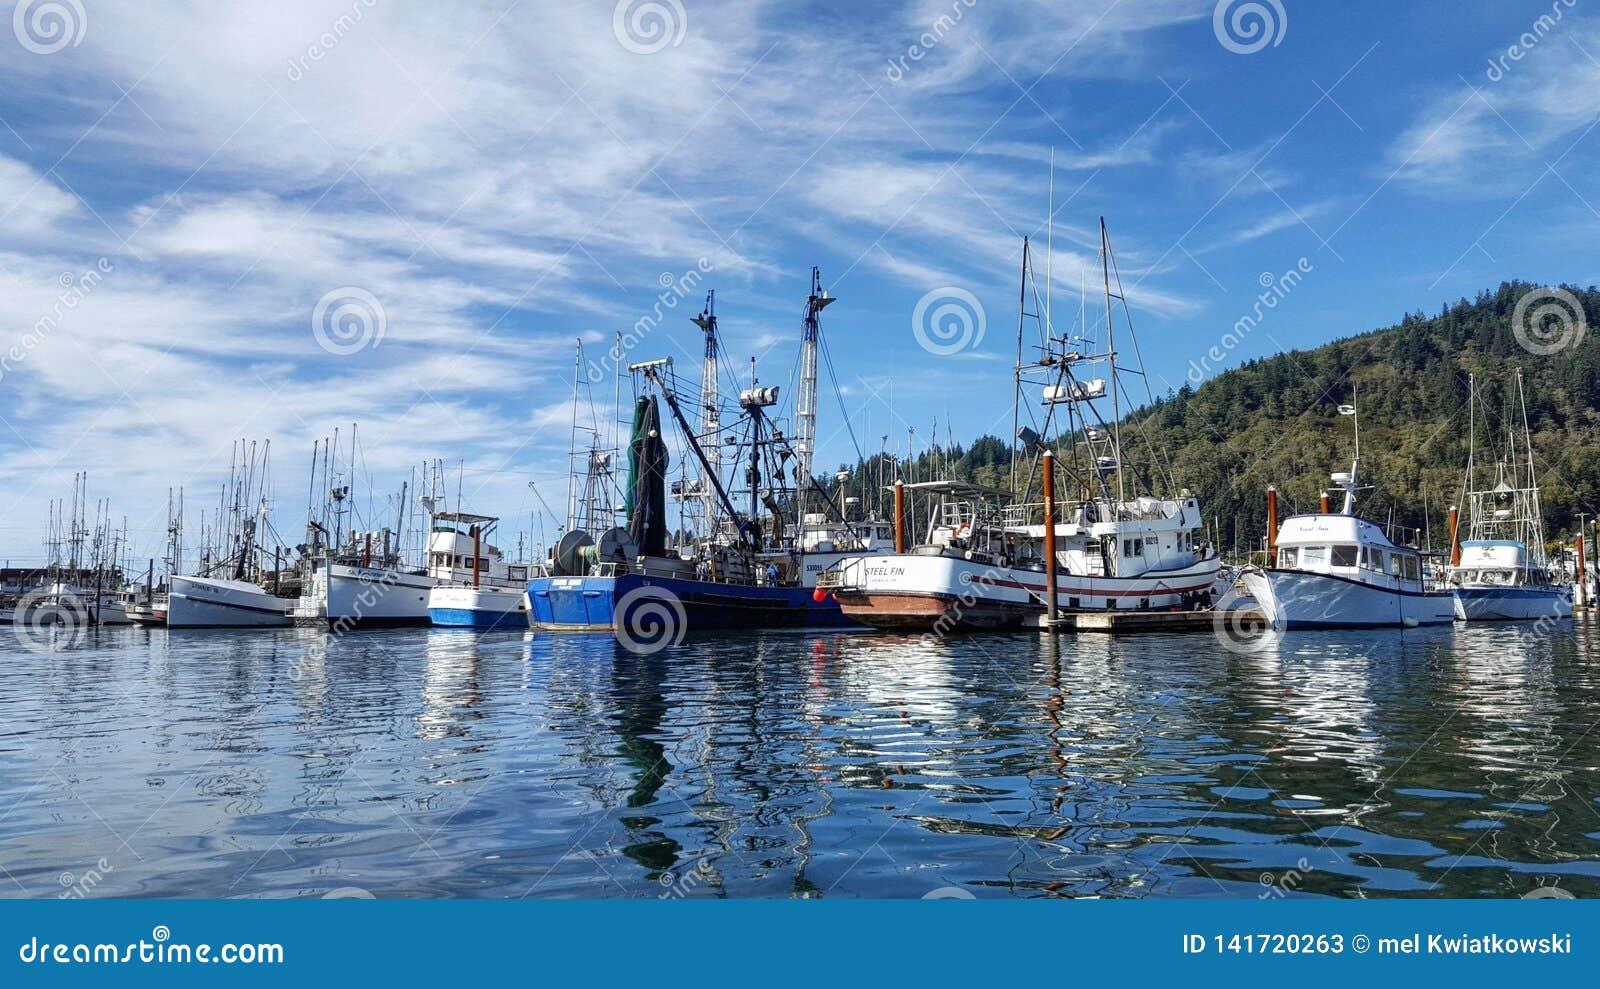 Boats by the docks in Tillamook Bay Oregon